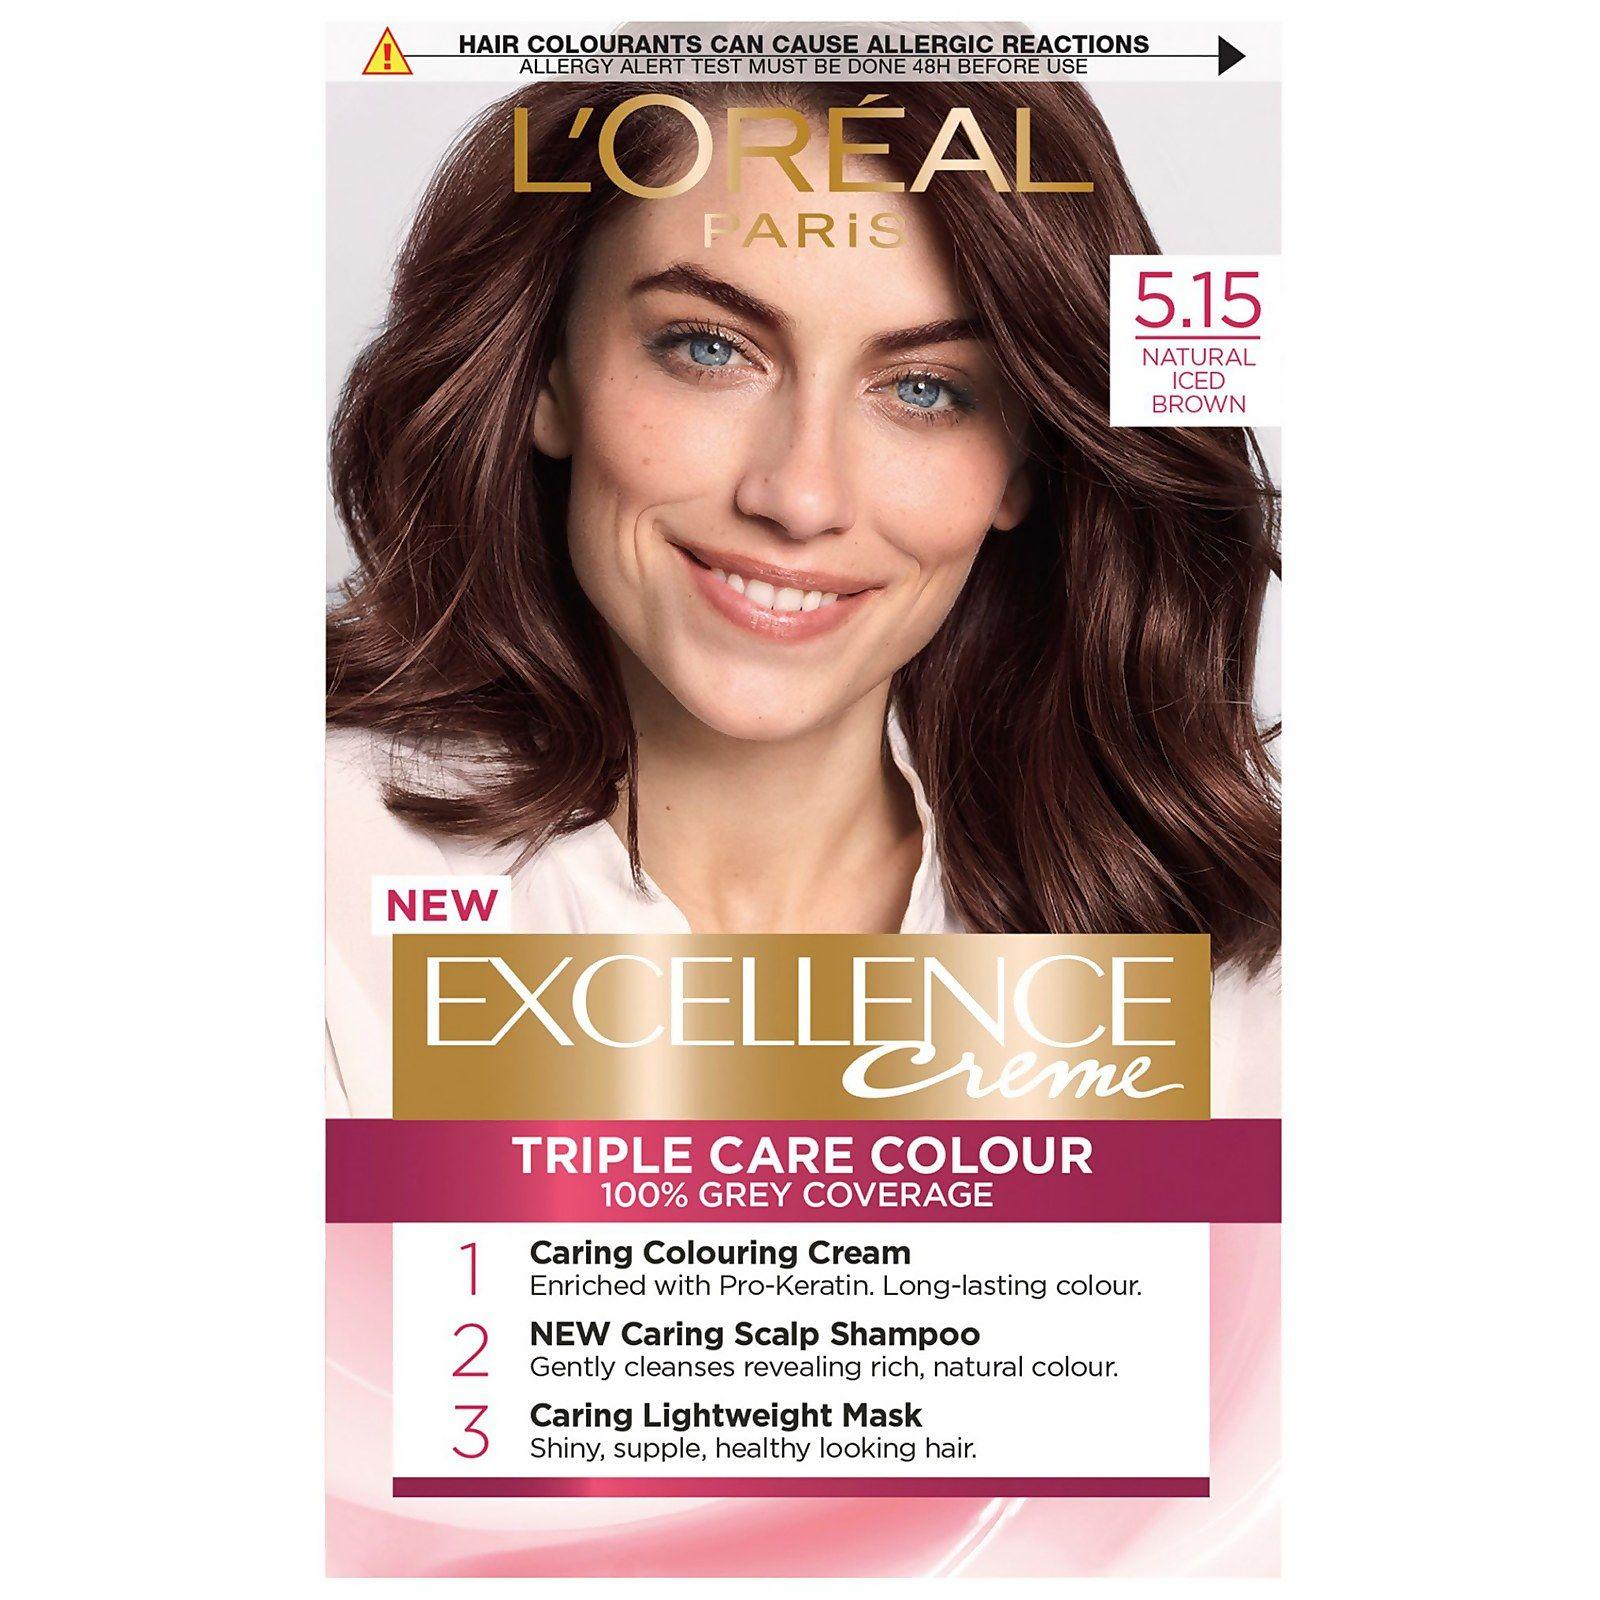 L Oreal Paris Excellence Creme Permanent Hair Dye Various Shades Brown Hair Dye Permanent Hair Dye Golden Brown Hair